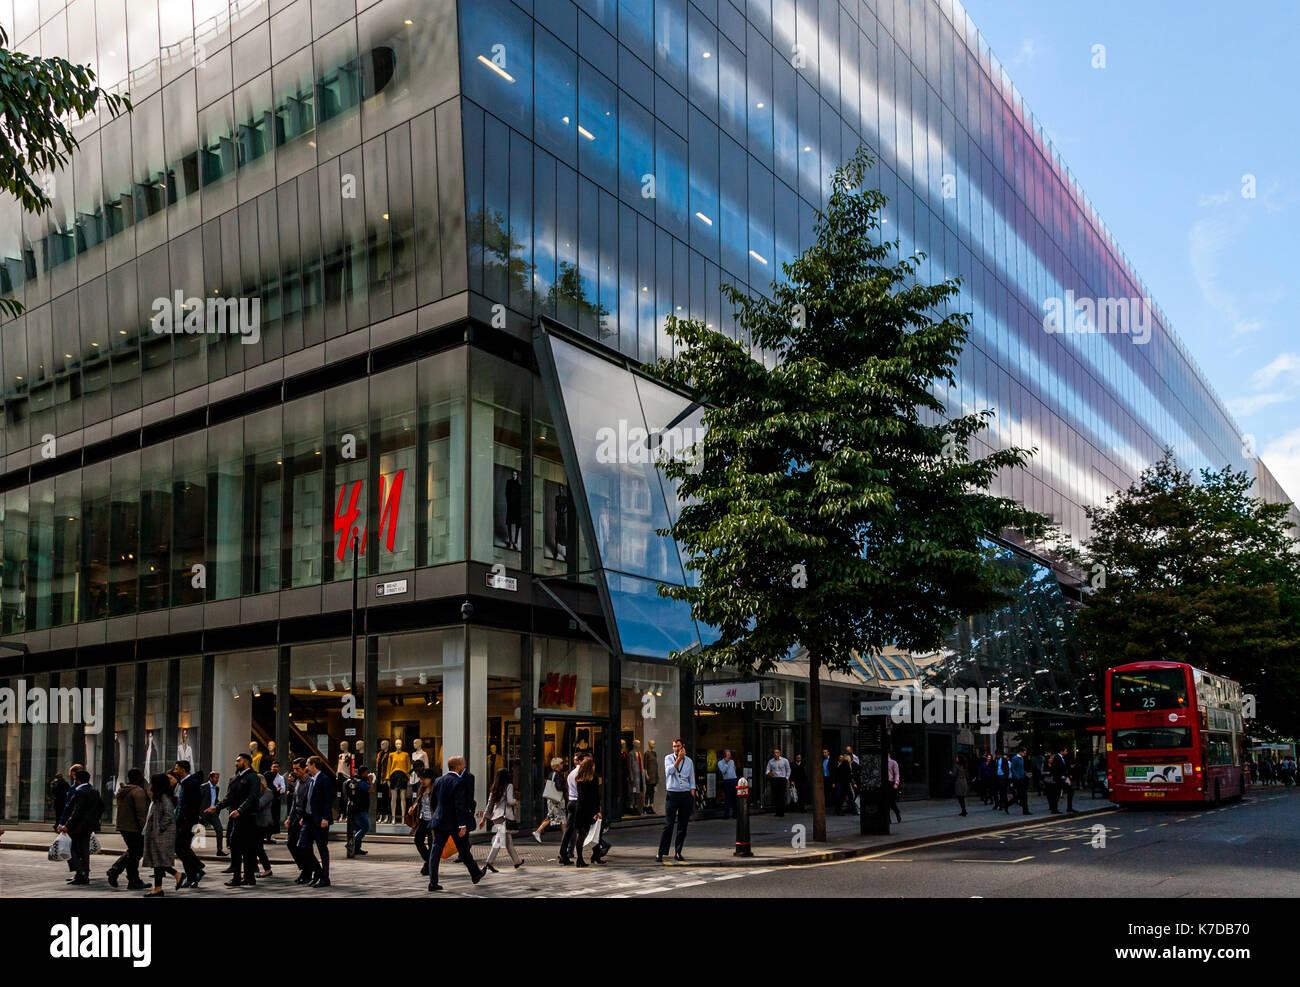 One New Change Shopping Centre, Cheapside, London, UK - Stock Image